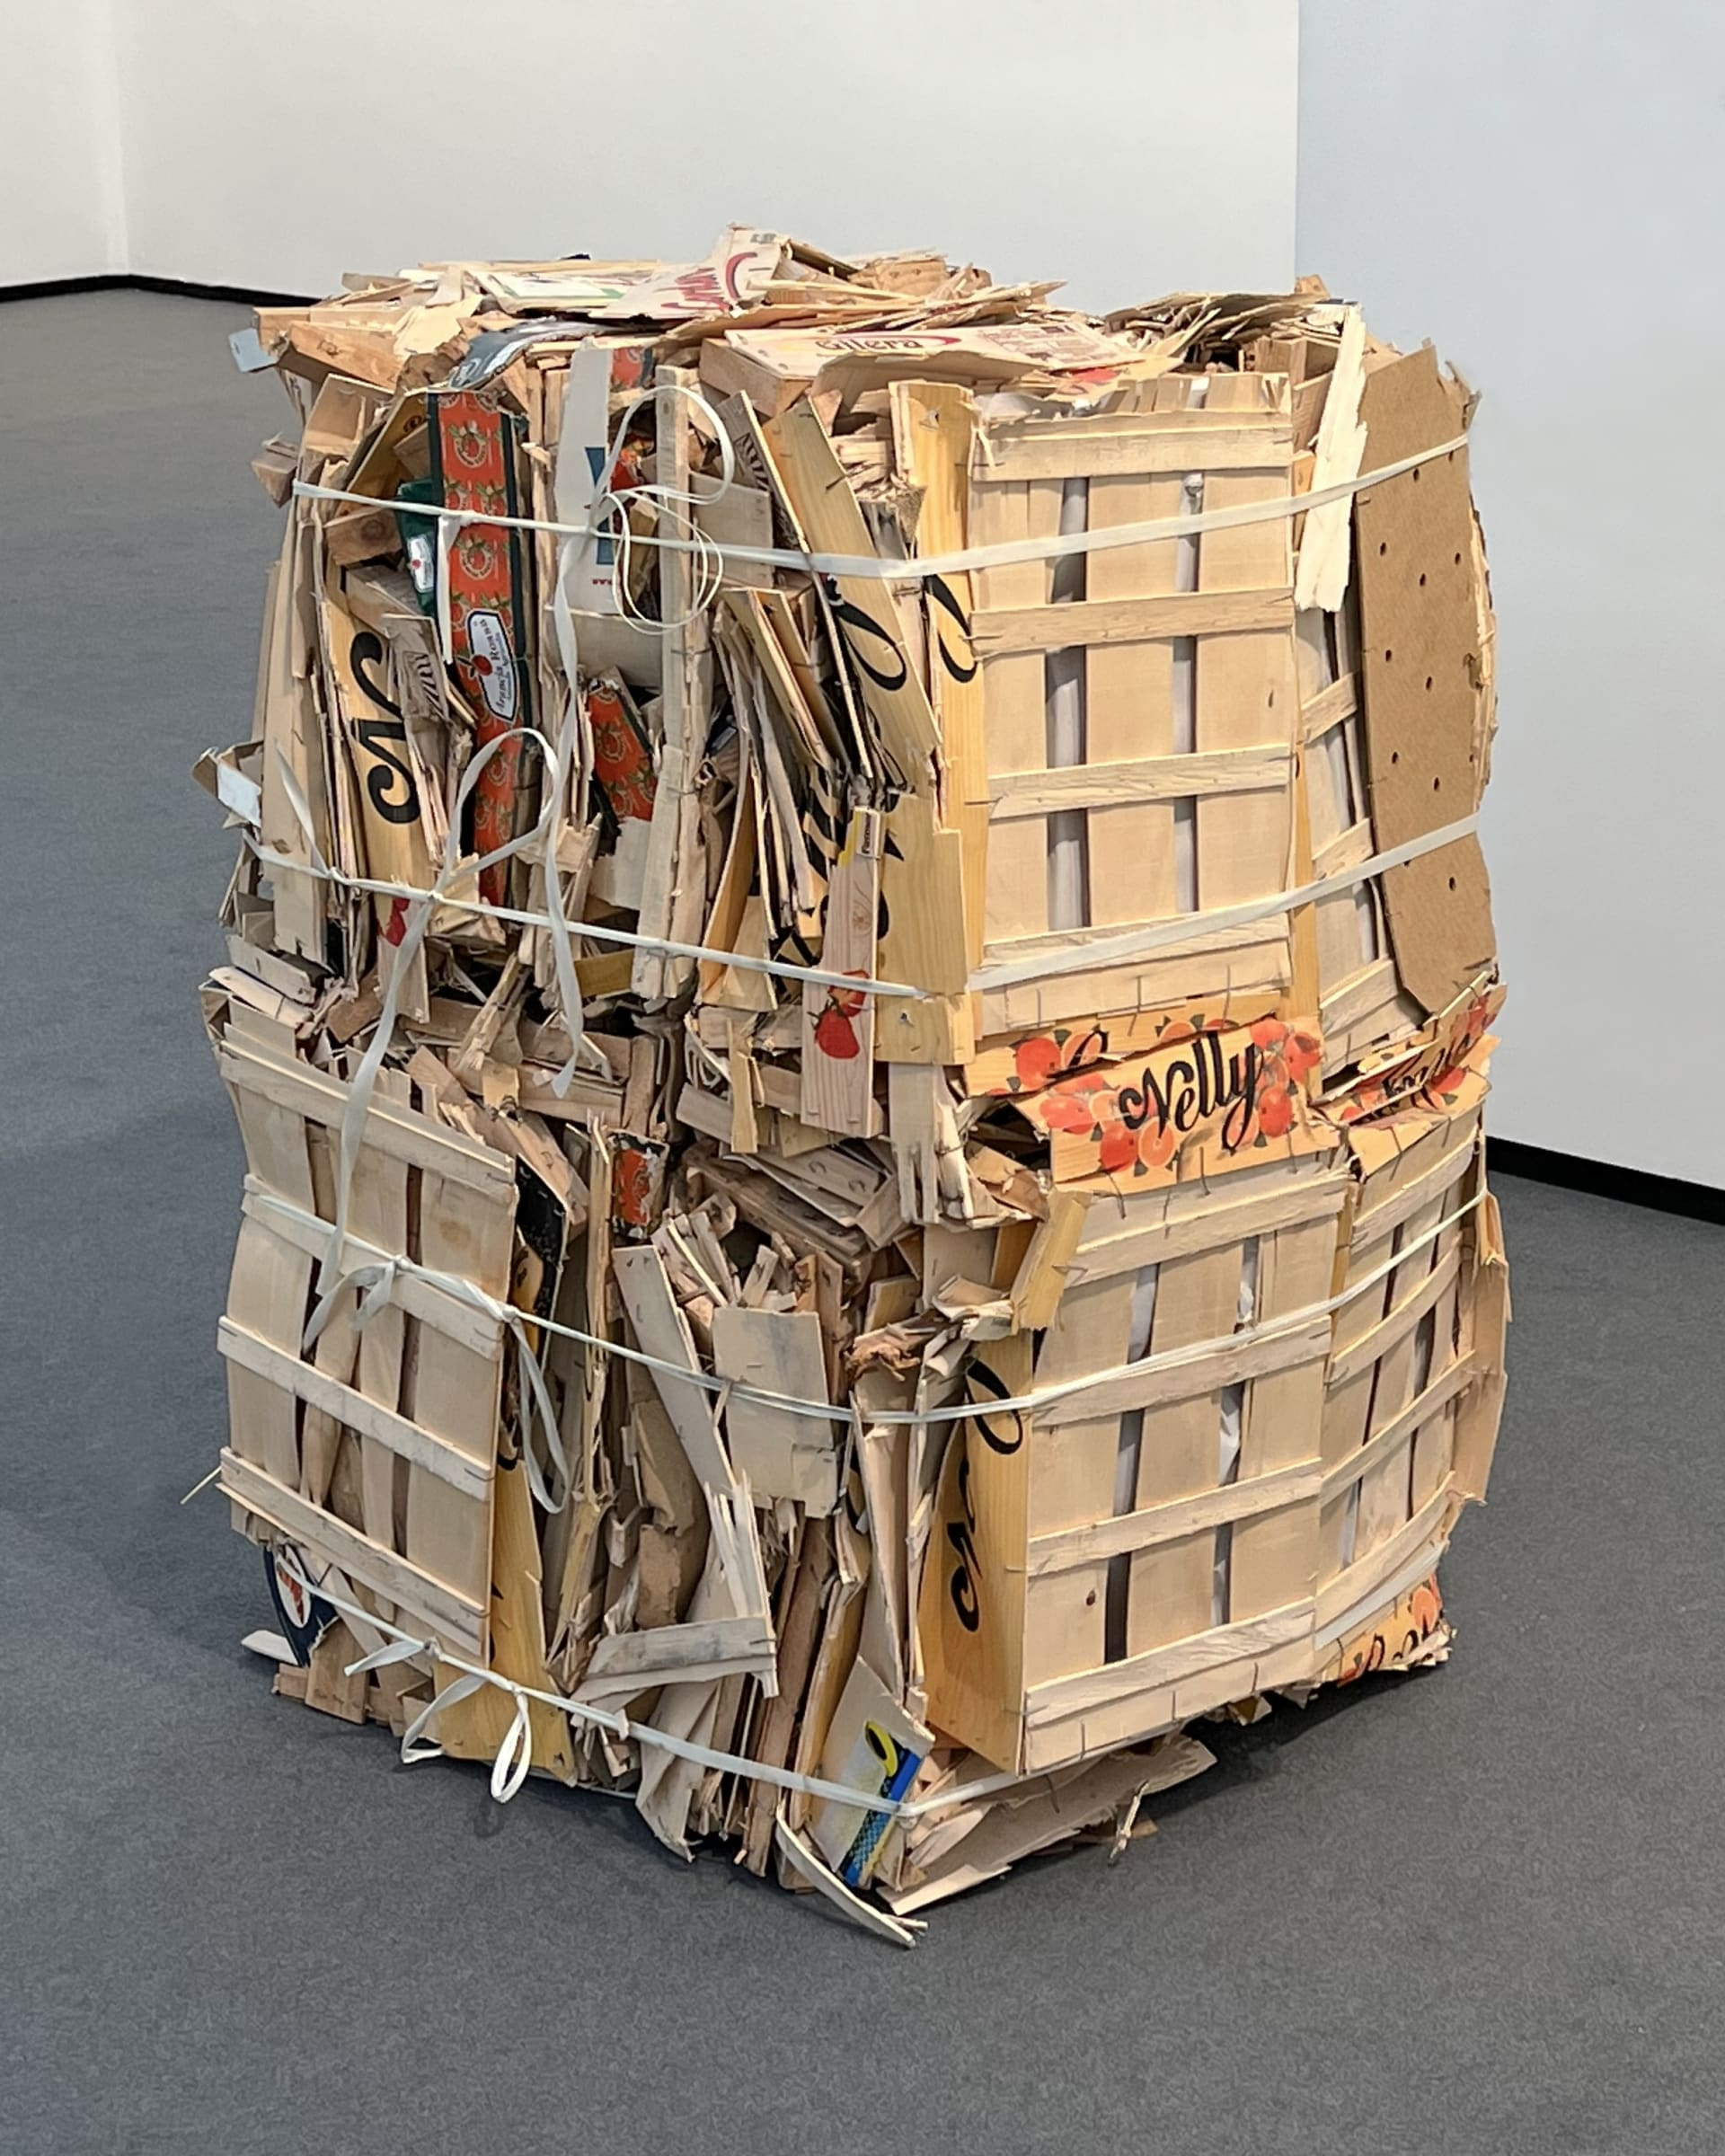 "<span class=""link fancybox-details-link""><a href=""/exhibitions/583/works/artworks_standalone11220/"">View Detail Page</a></span><div class=""medium"">Scrap wood, paper and plastic</div><div class=""dimensions"">c. 120 x 80 x 80 cm</div>"